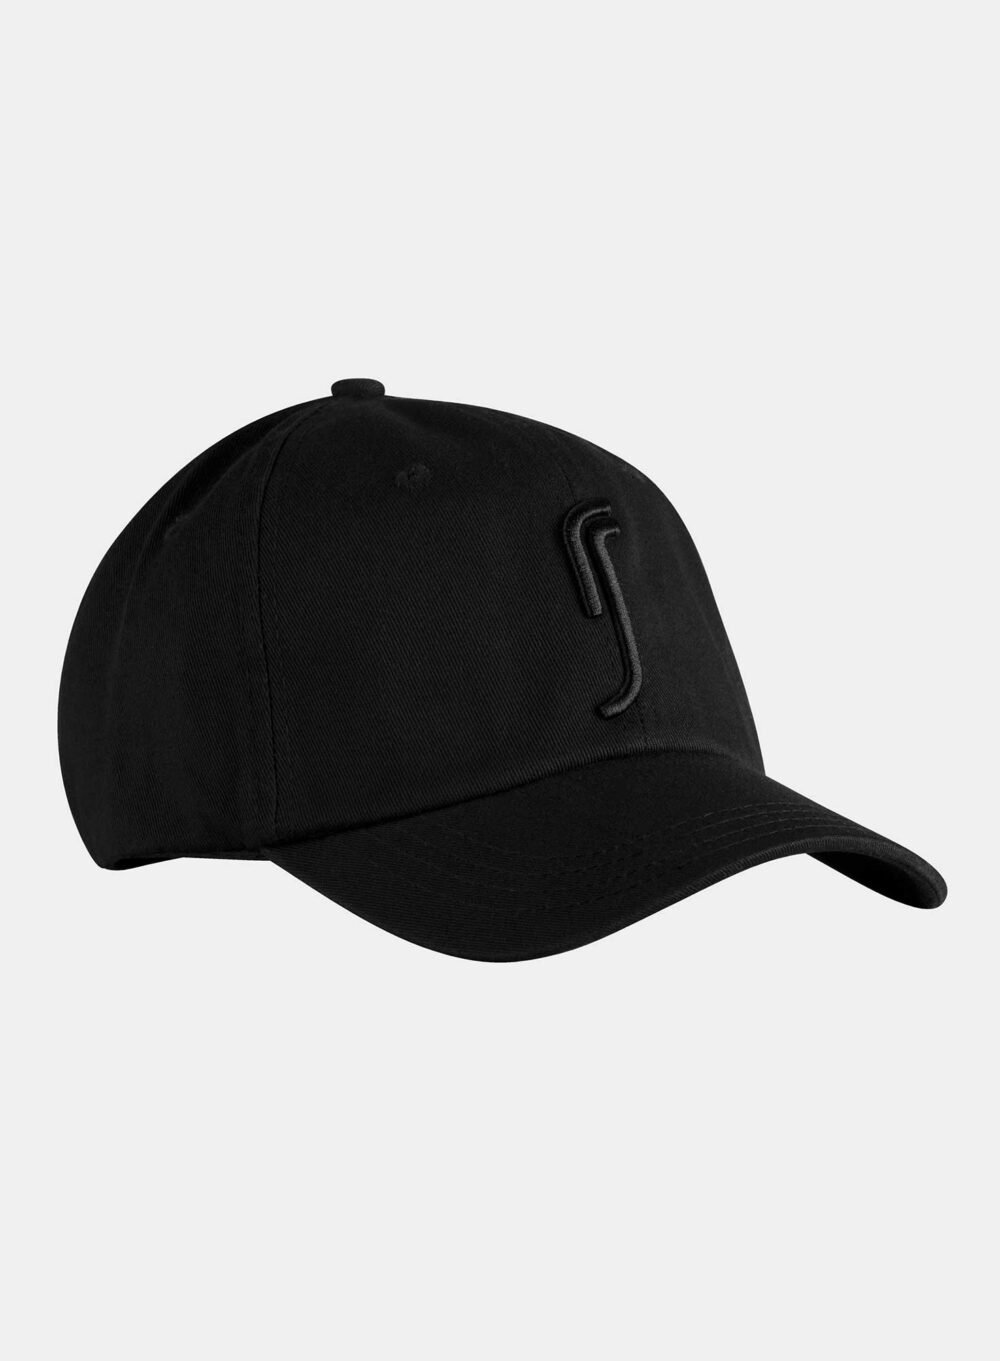 sports_dad_hat_black_1